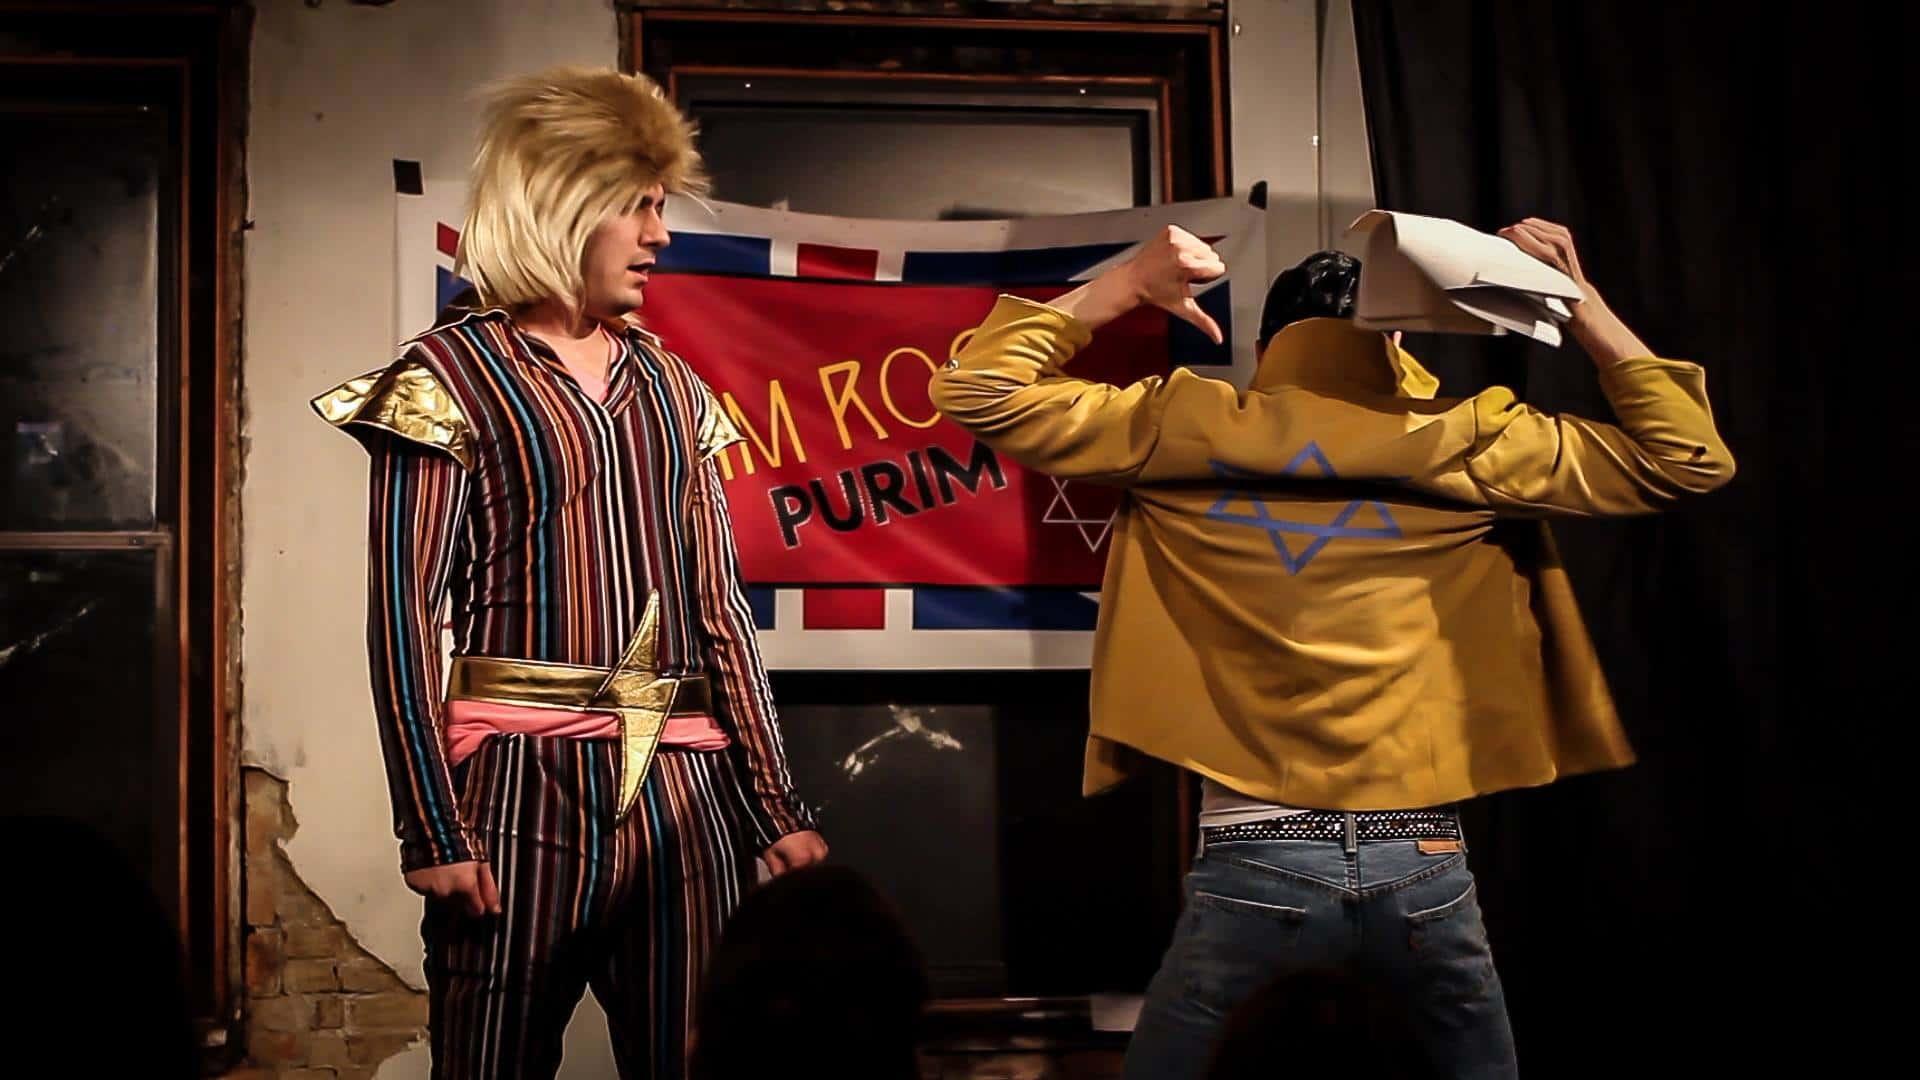 Freddy Mordecai - Glam Rock Purim